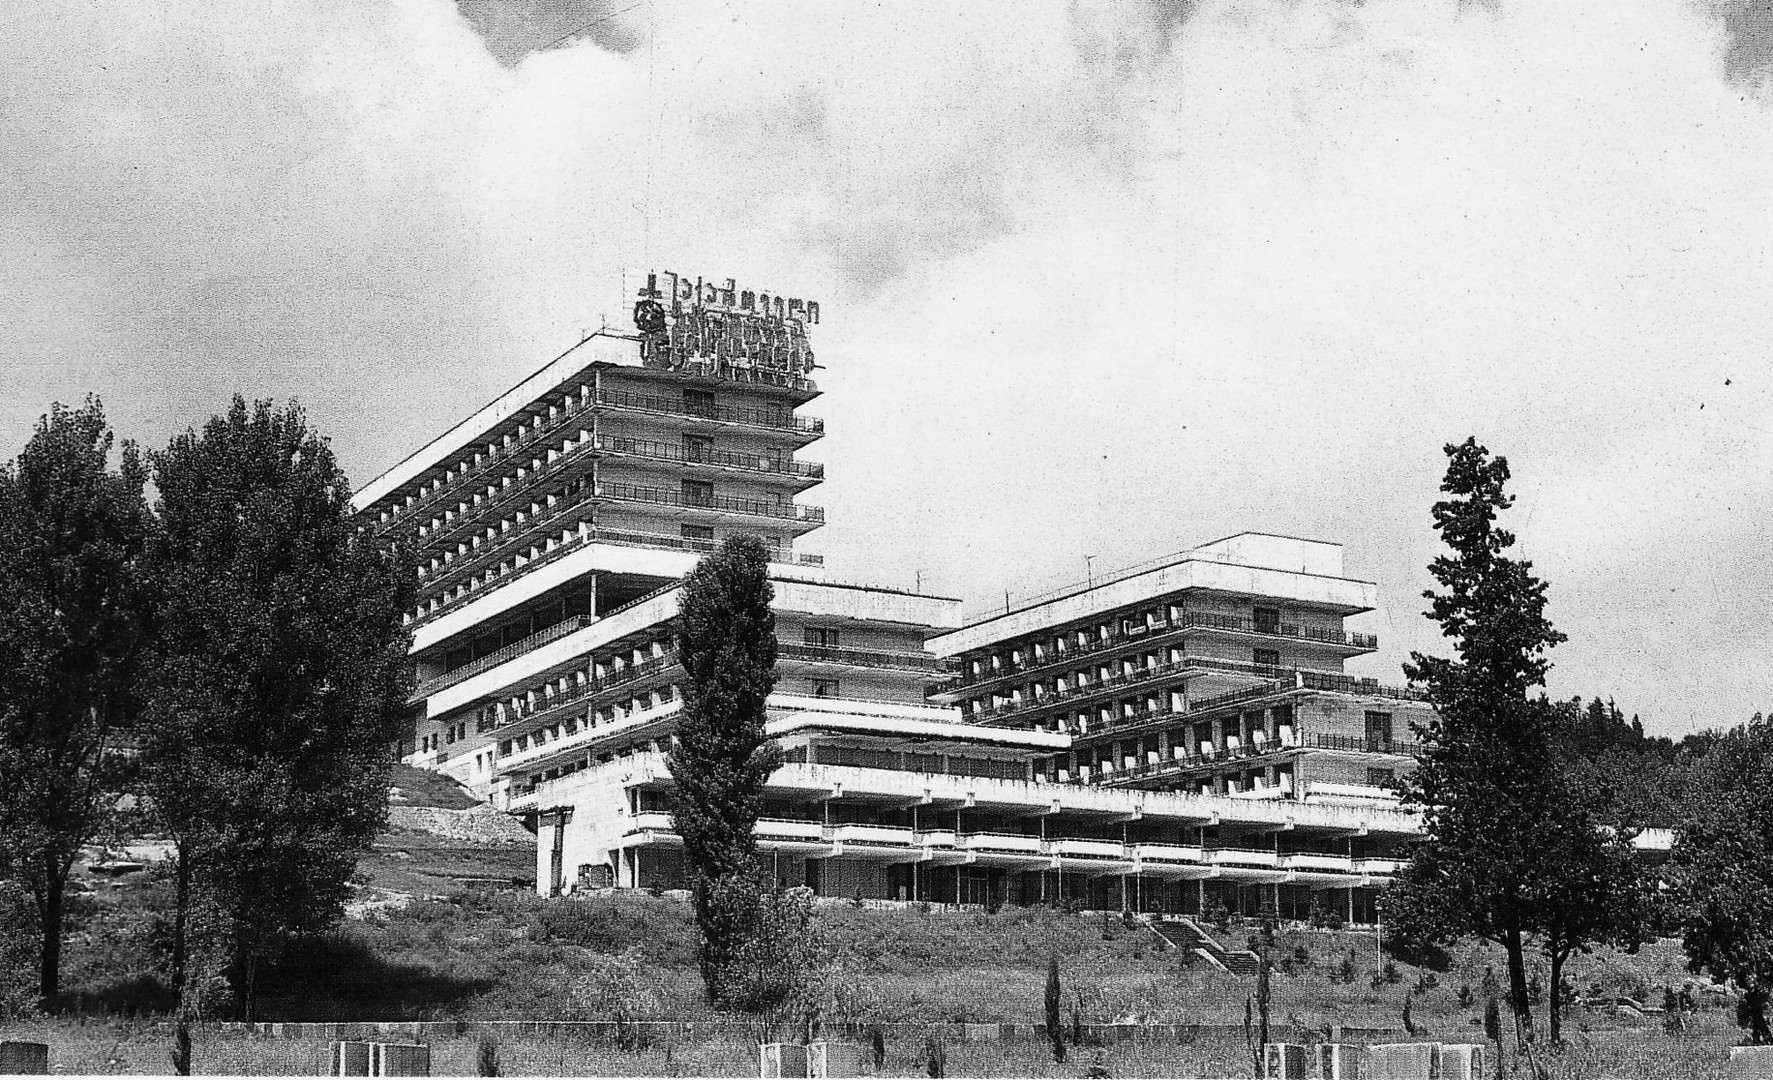 Sakartvelo-sanatorium.jpg